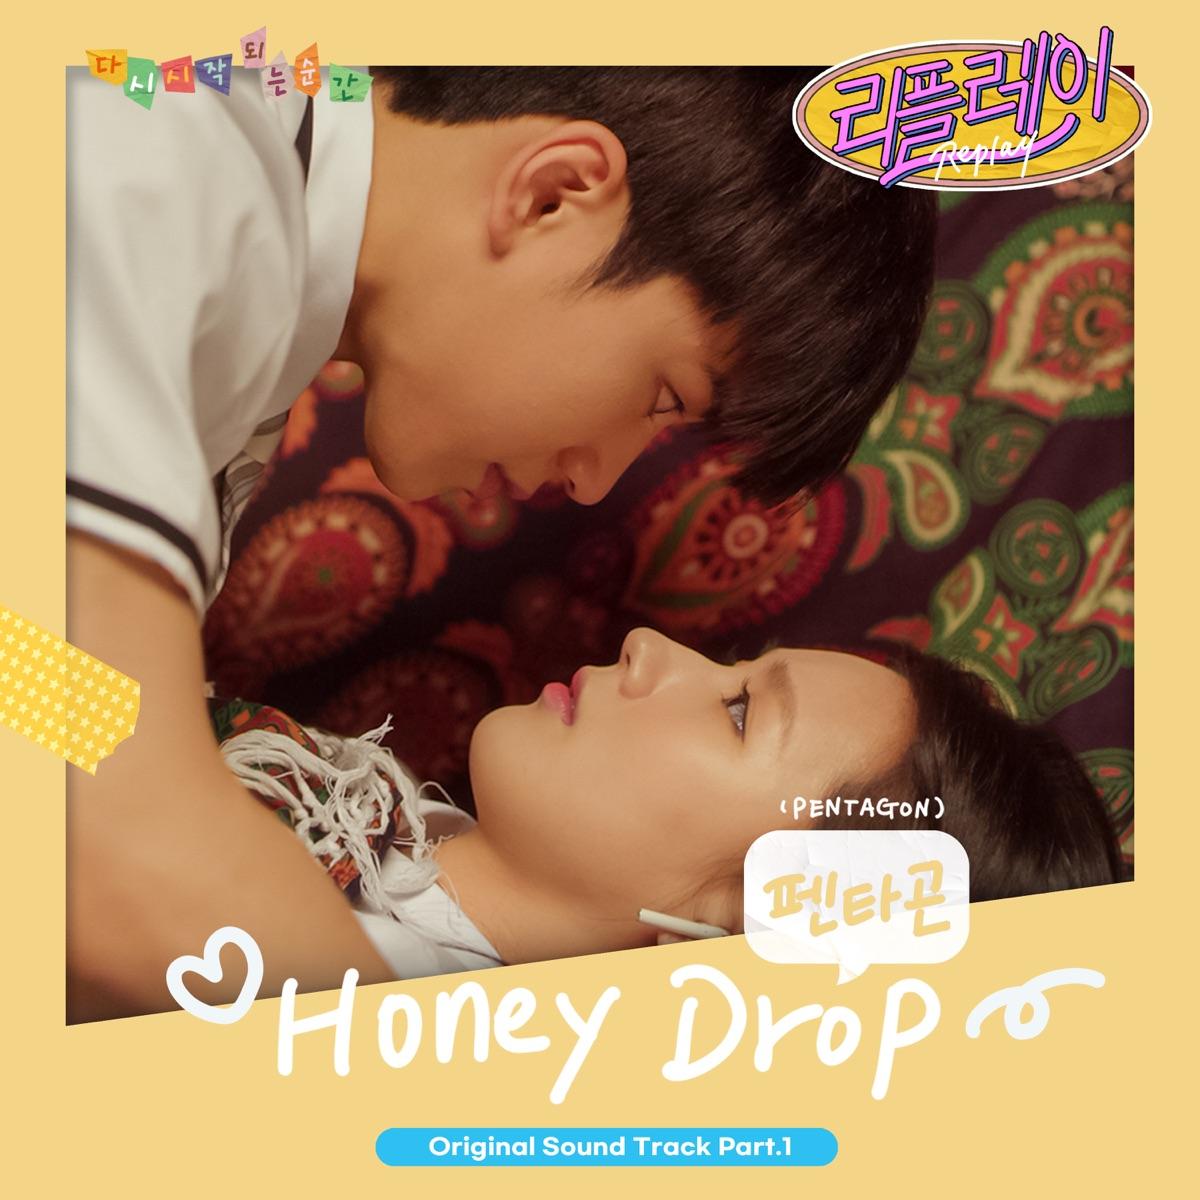 『PENTAGON - Honey Drop』収録の『Replay (Original Television Soundtrack), Pt. 1』ジャケット